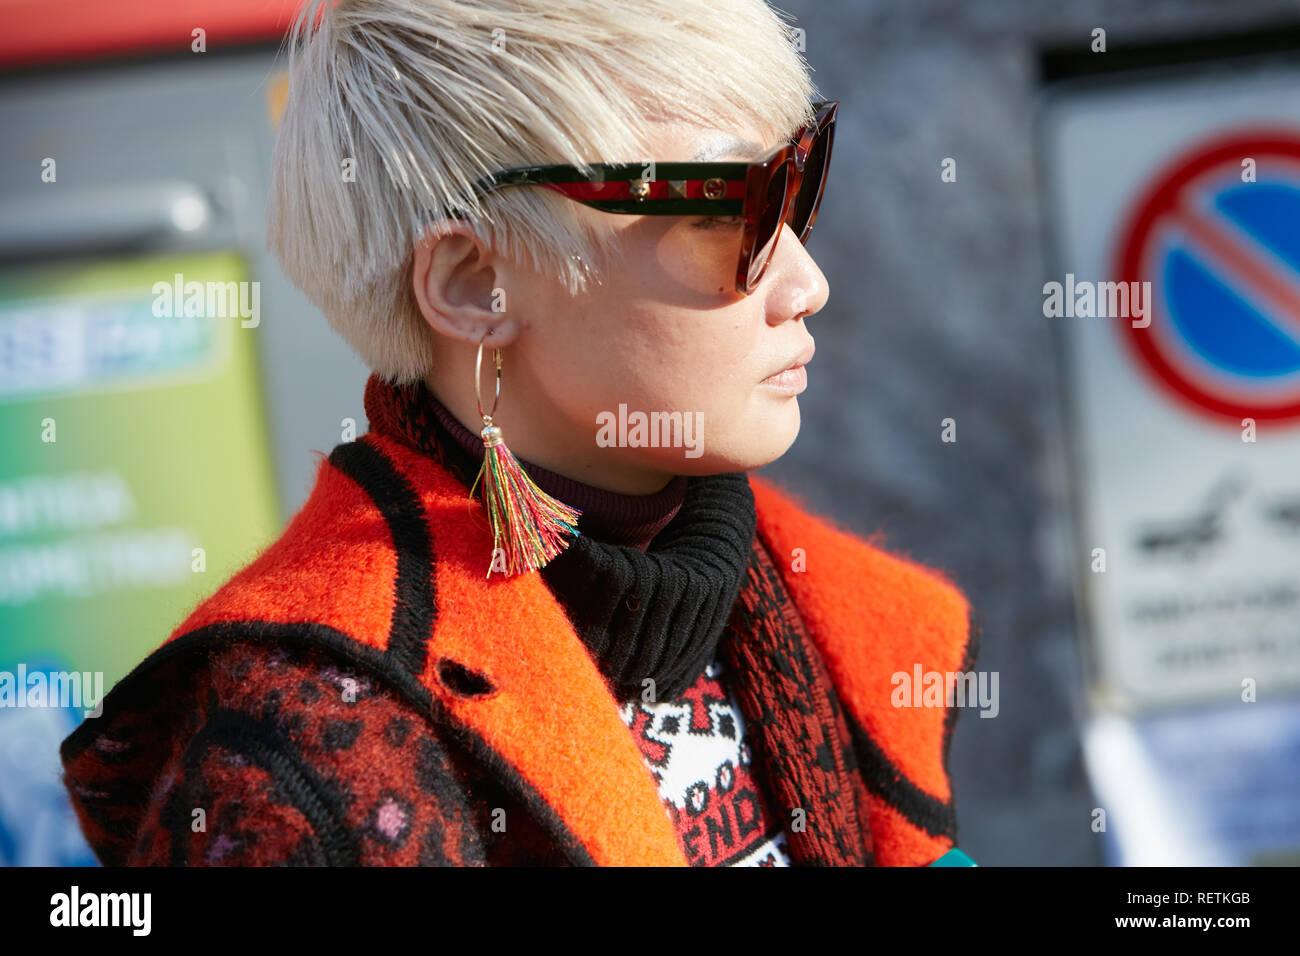 8b273022 Gucci Sunglasses Stock Photos & Gucci Sunglasses Stock Images - Alamy